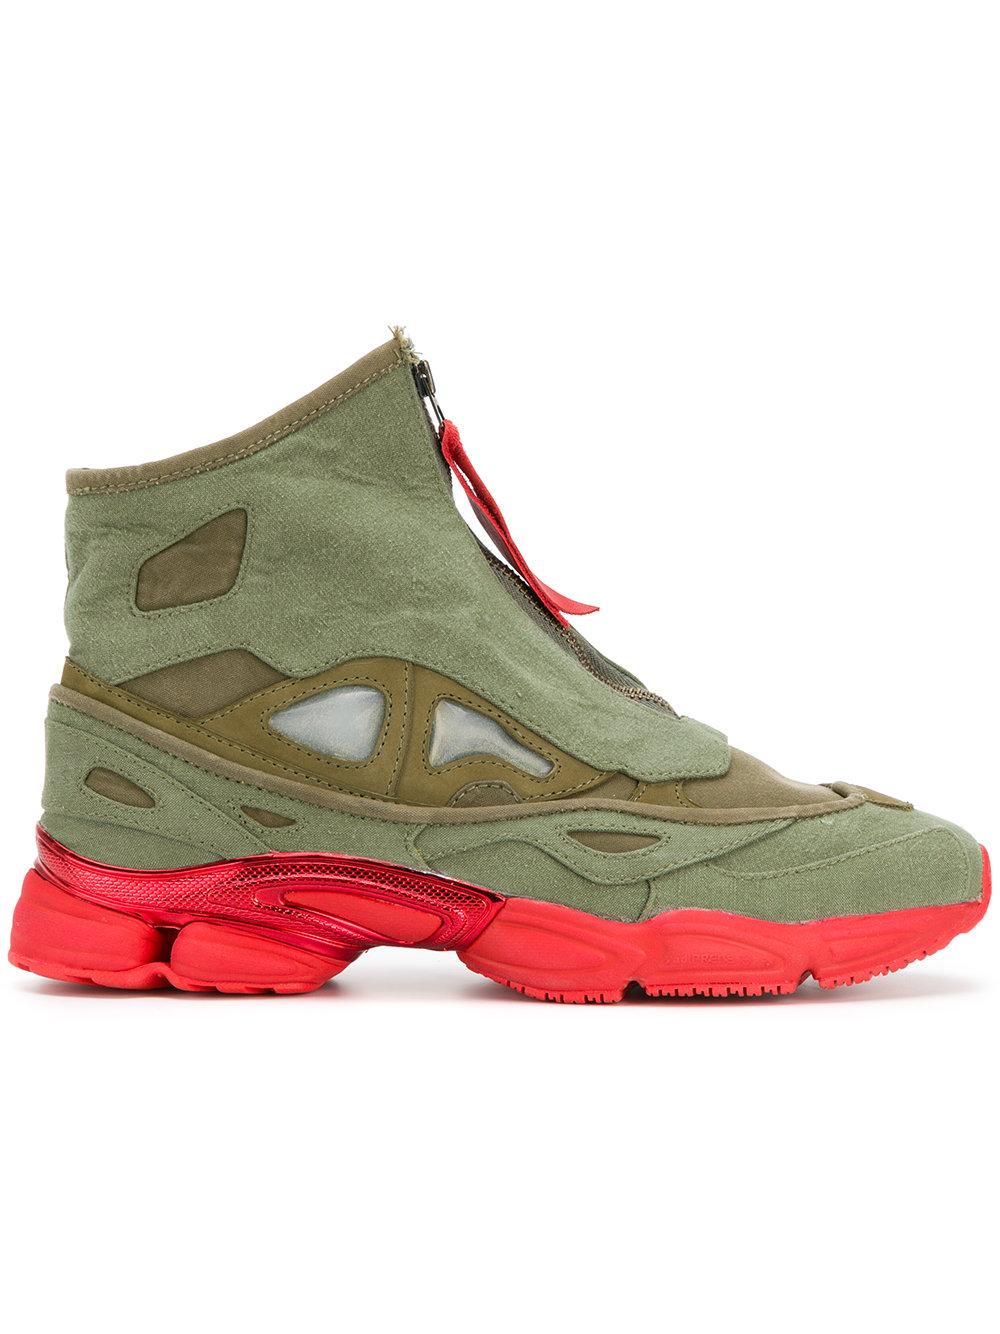 The Shoe Surgeon x Farfetch Raf Simons Ozweego Sneakers